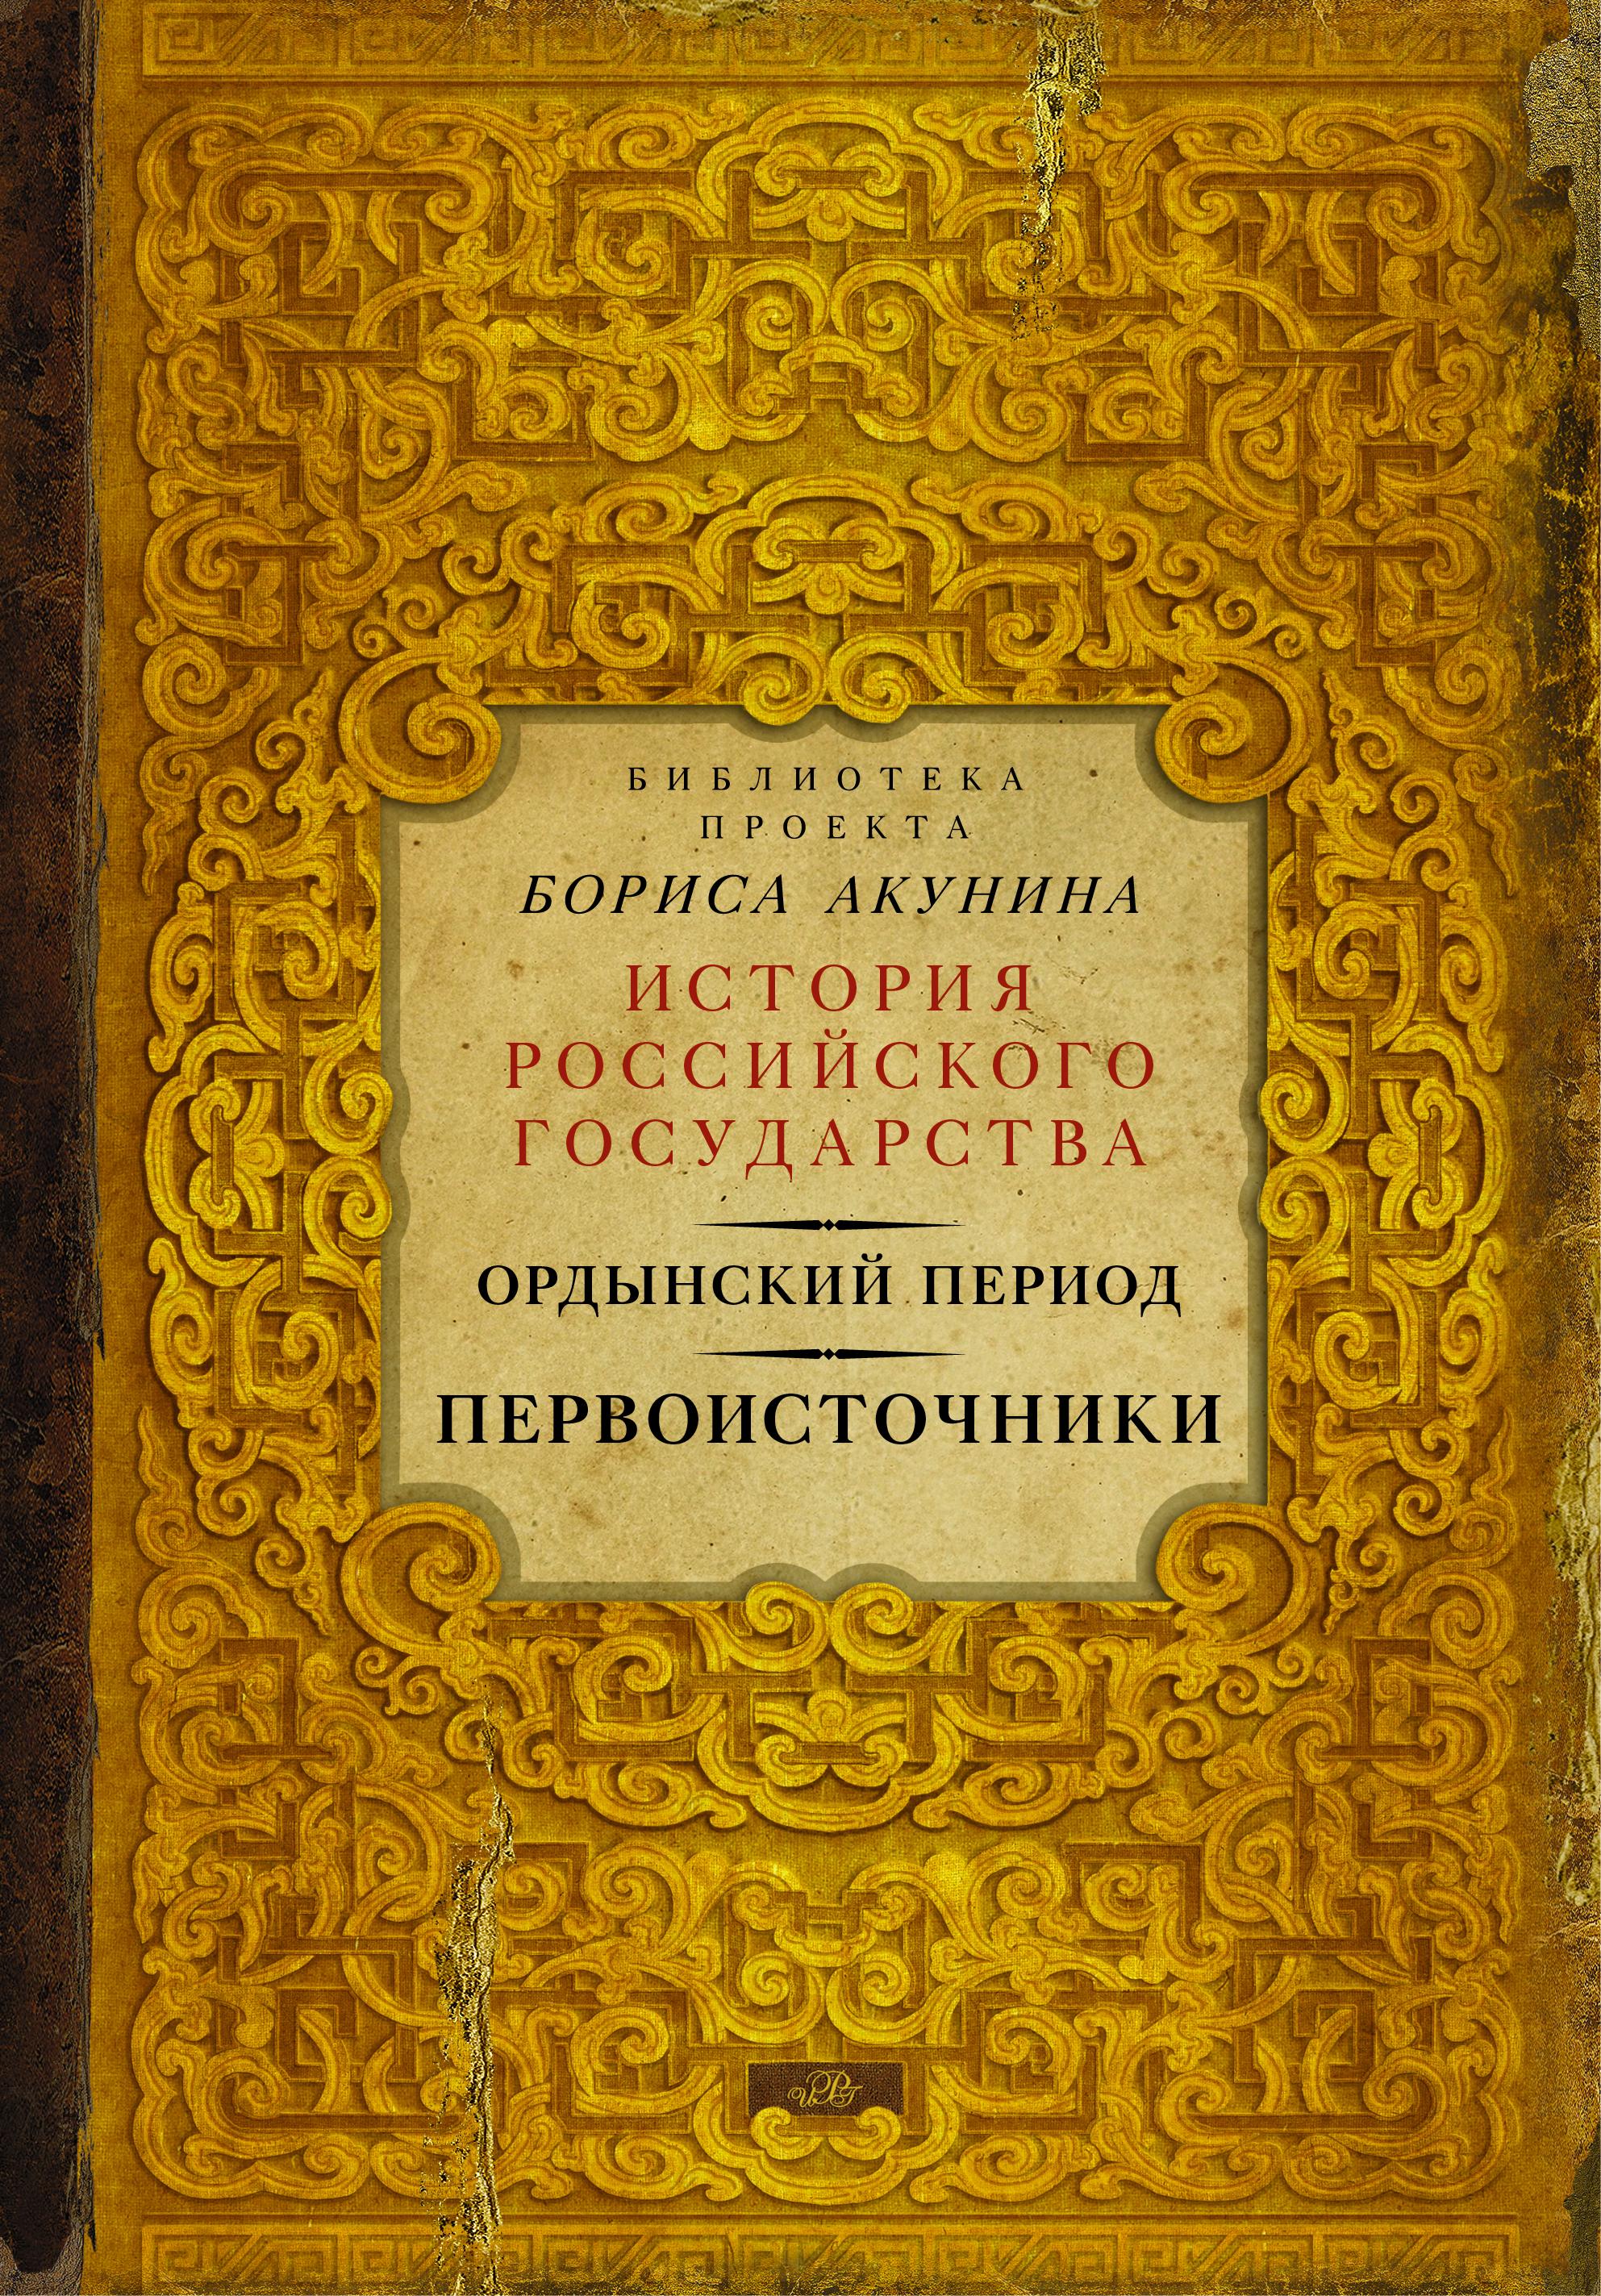 Борис Акунин Ордынский период. Первоисточники (библиотека проекта Бориса Акунина ИРГ)